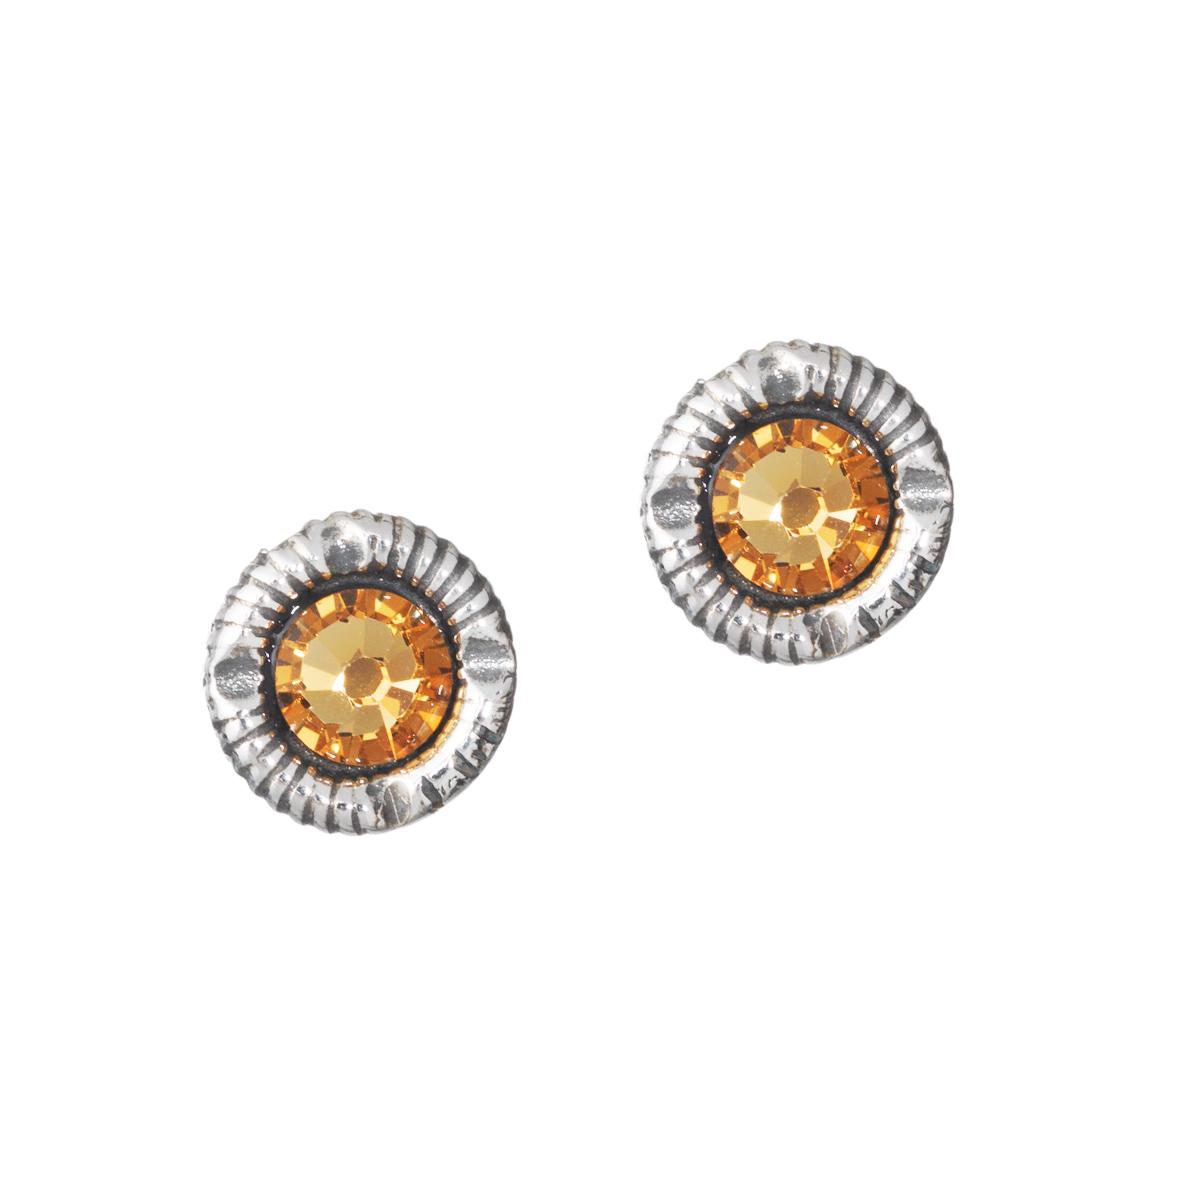 HUL 20026-3 - Små øyrepynt til Jubileumsdrakten, gyllen stein